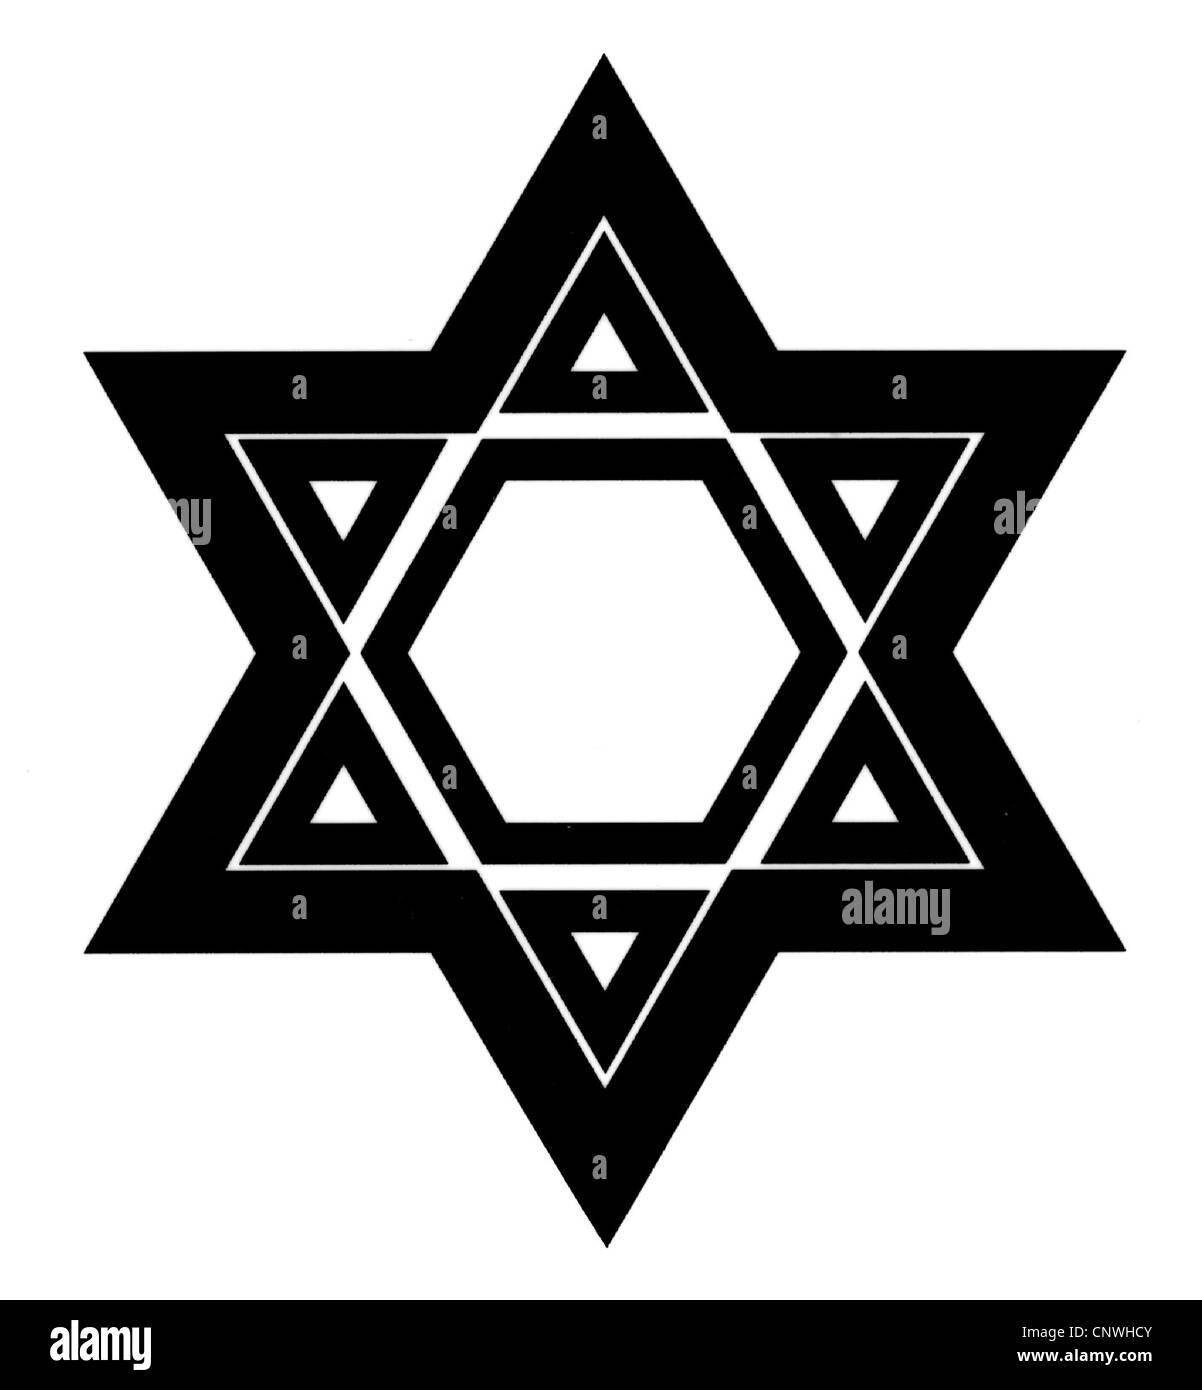 Symbols Star Of David Computer Graphics Jews Judaism Jewry